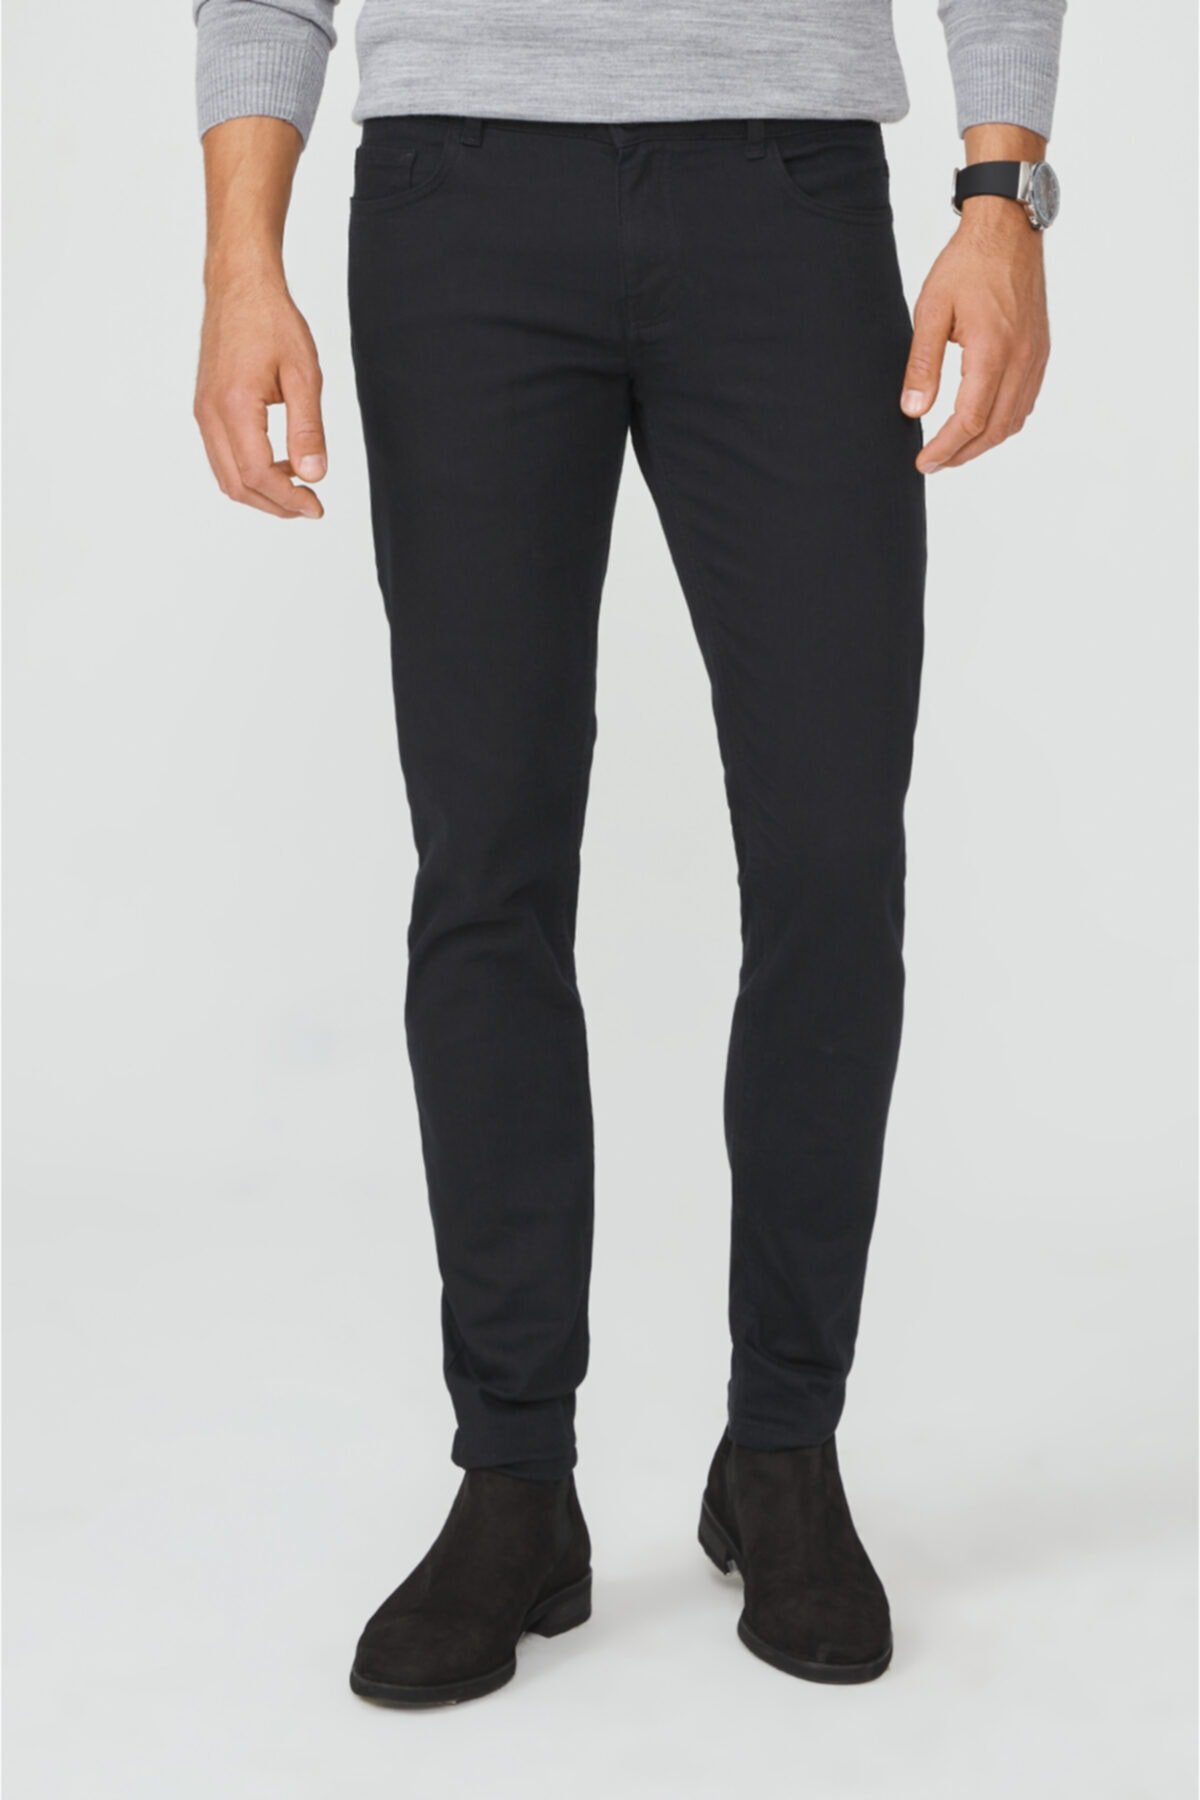 Avva Erkek Siyah 5 Cepli Slim Fit Pantolon A02y3055 2